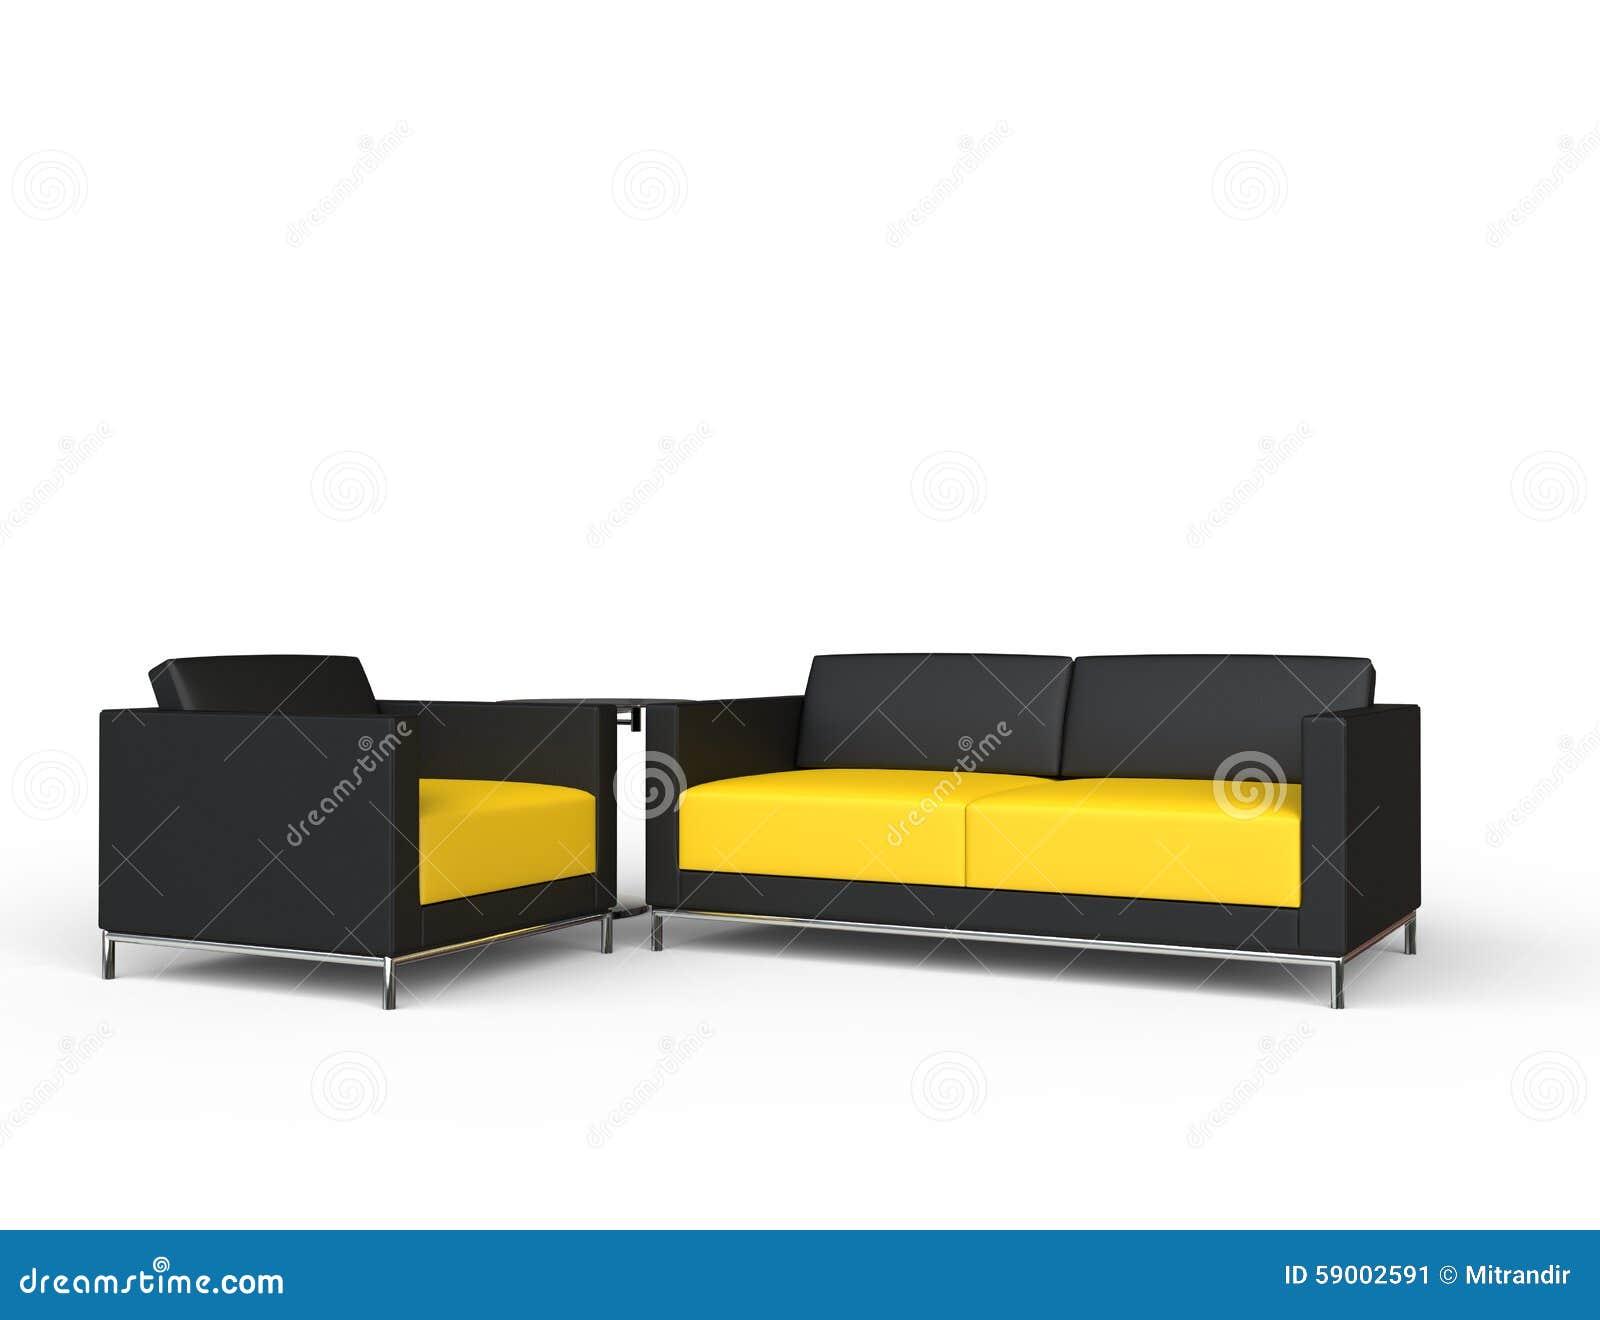 Black And Yellow Sofa And Armchair Set Stock Illustration